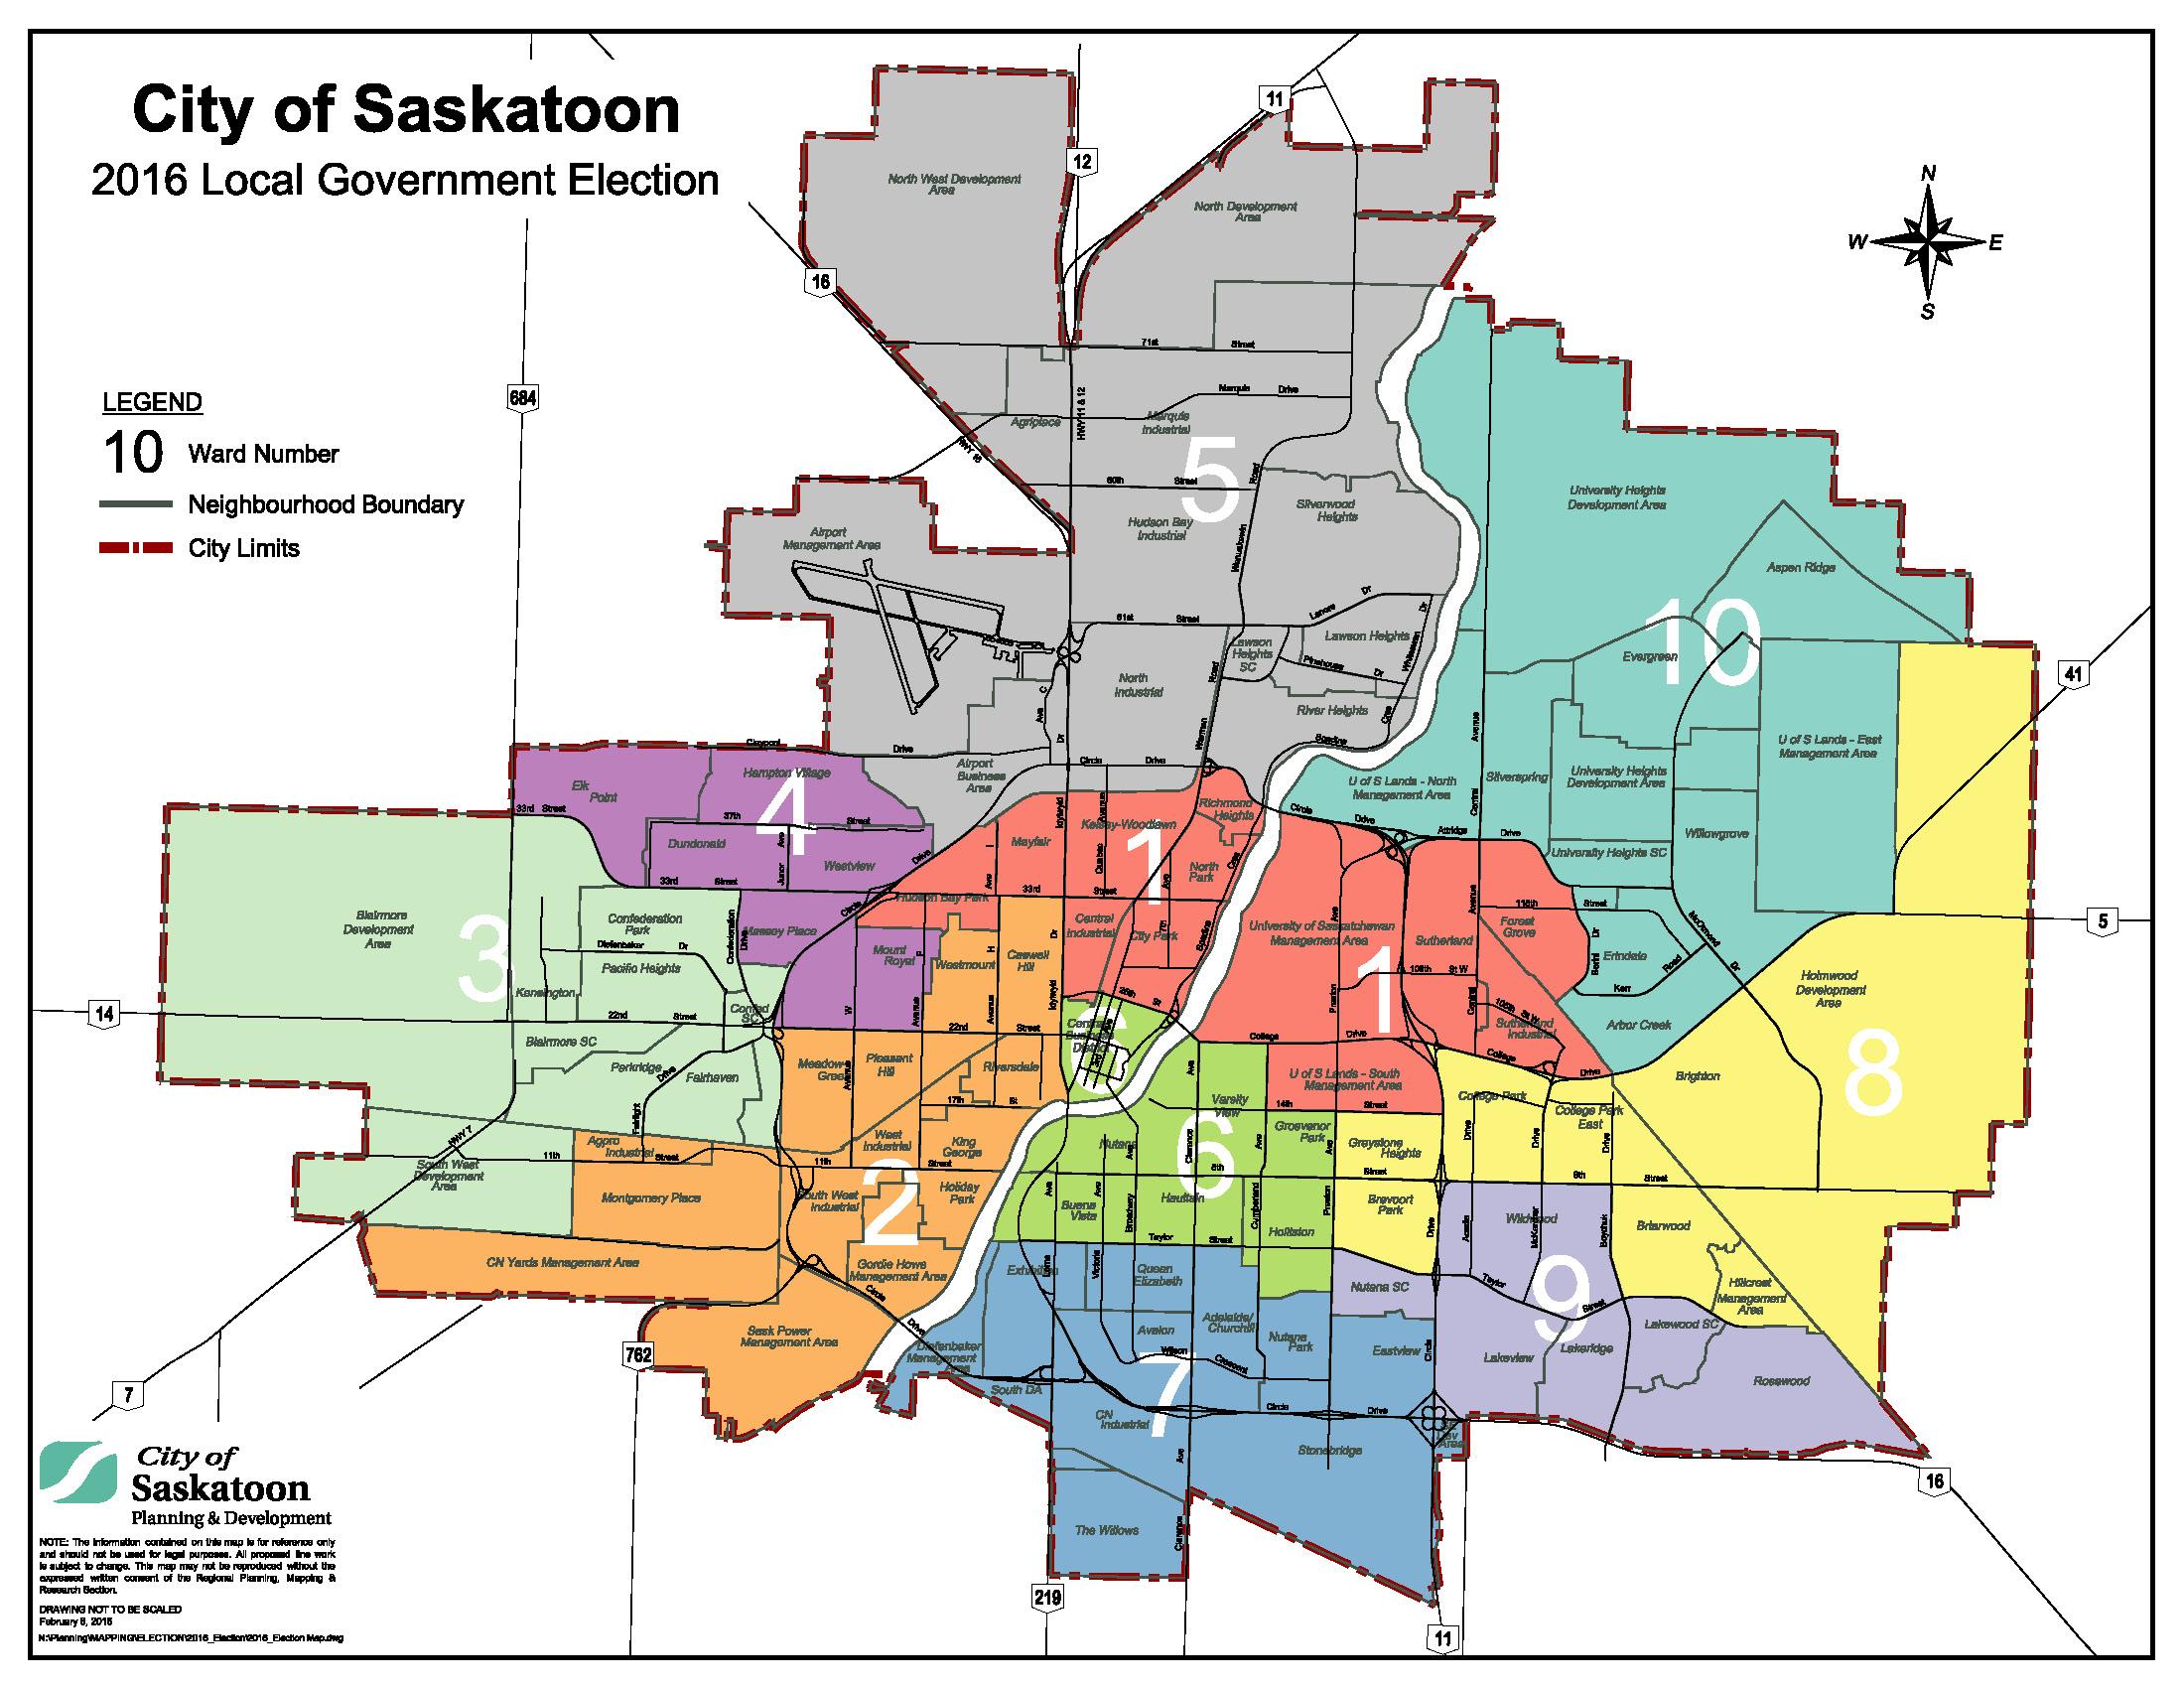 2016 Municipal Election Boundaries